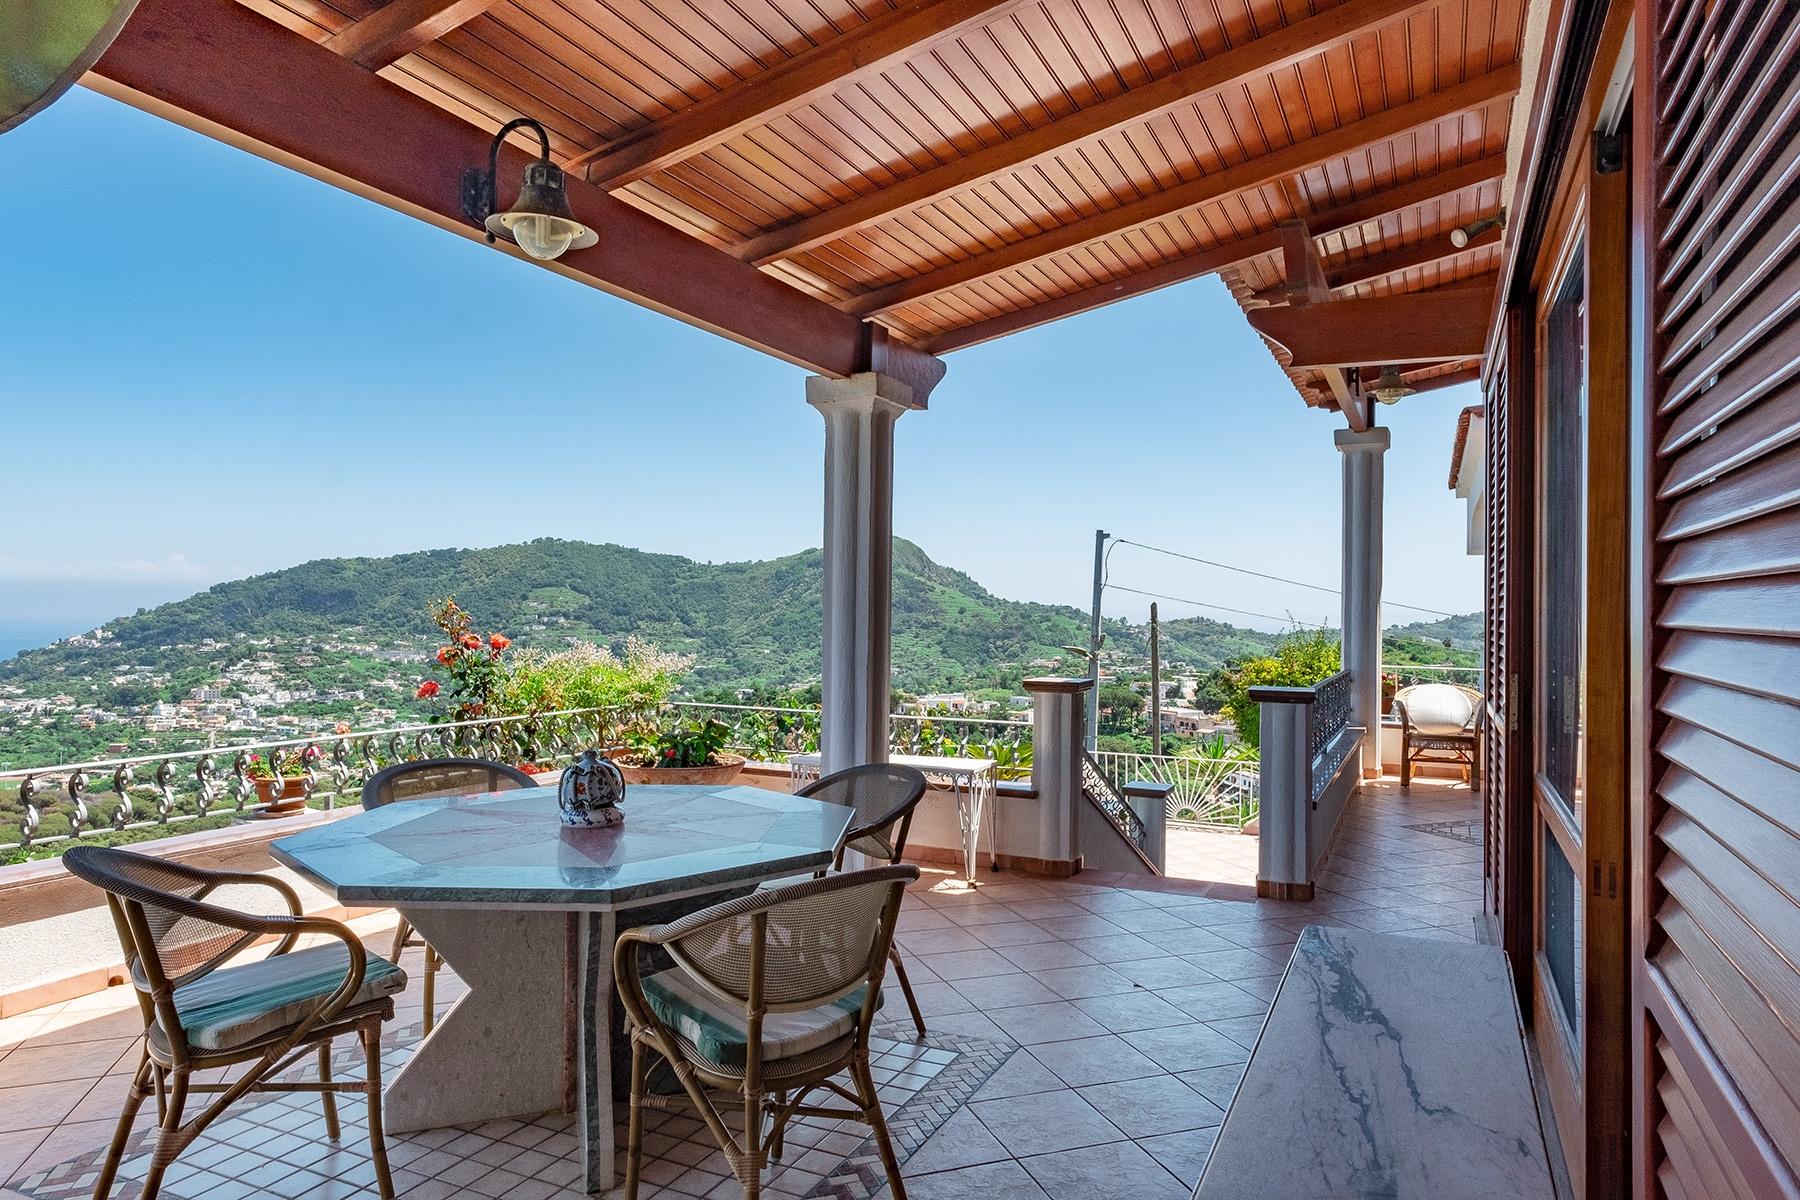 Villa in Vendita a Ischia: 5 locali, 138 mq - Foto 3